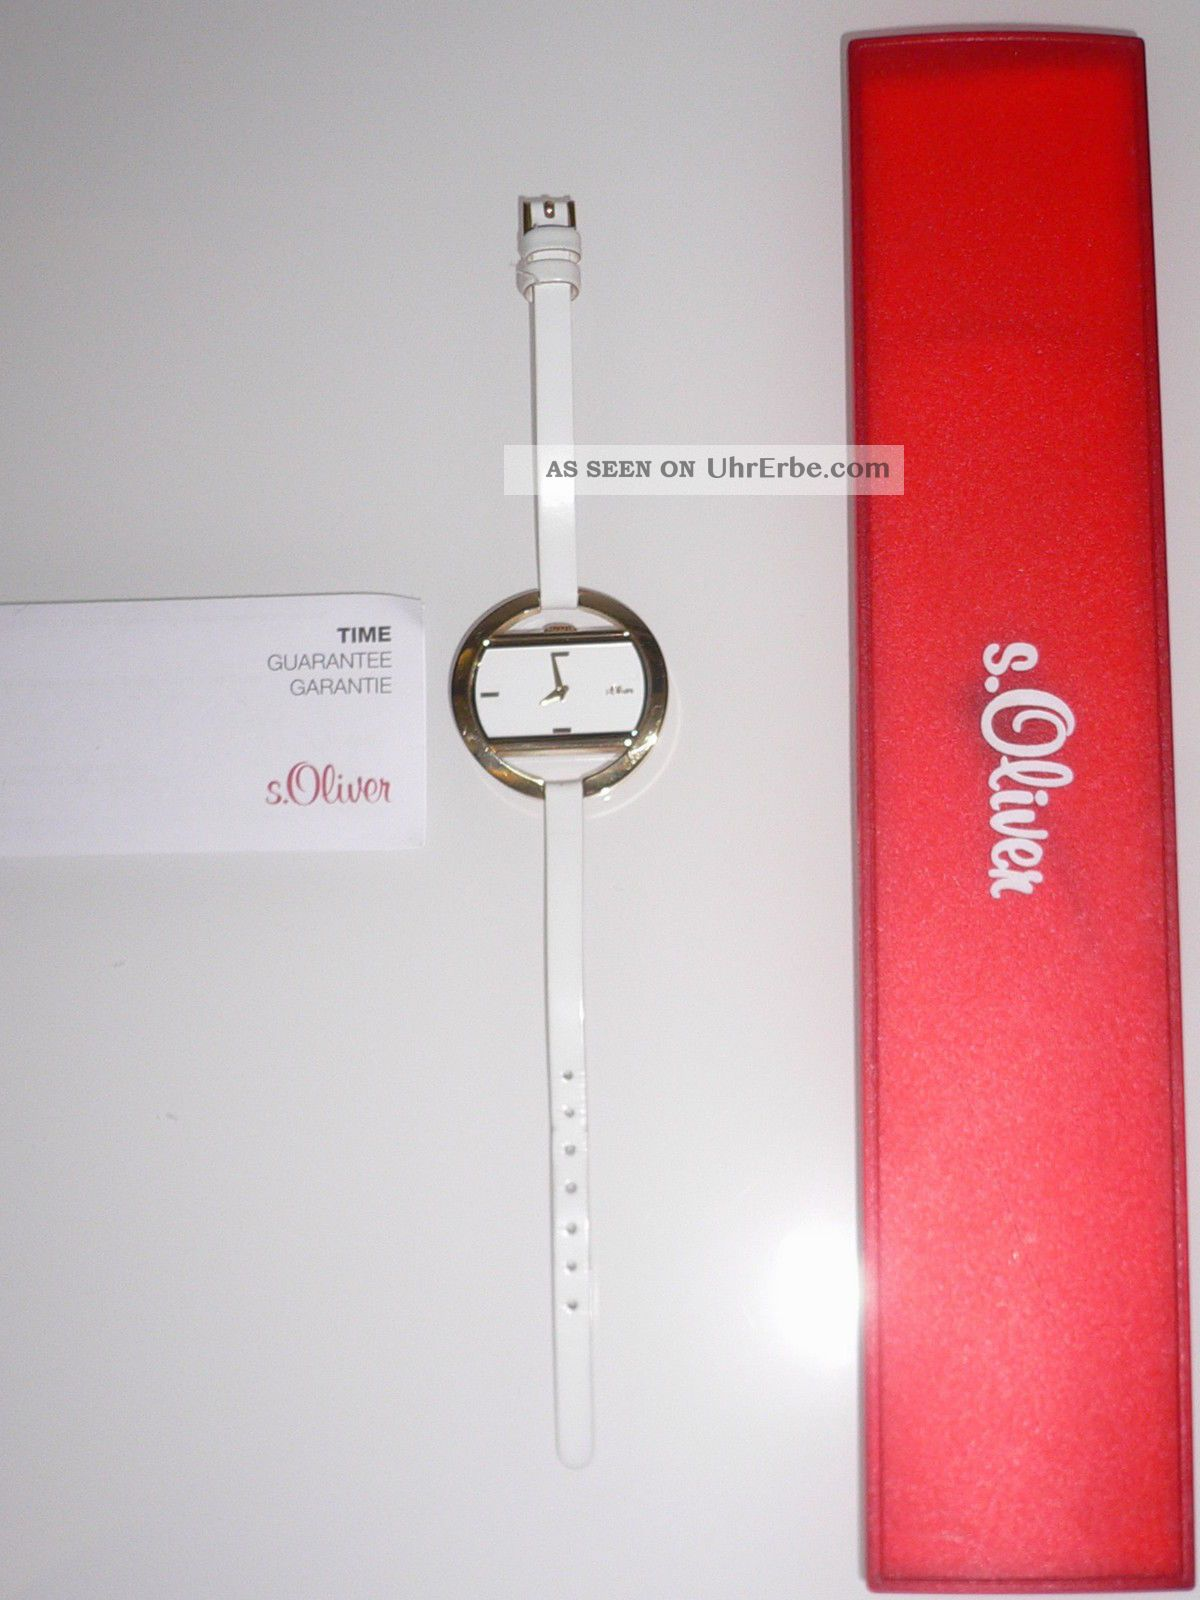 S Oliver Uhr Damenuhr So - 1240 - Lq Weiß Gold Elegant Armbanduhr Markenuhr Blogger Armbanduhren Bild